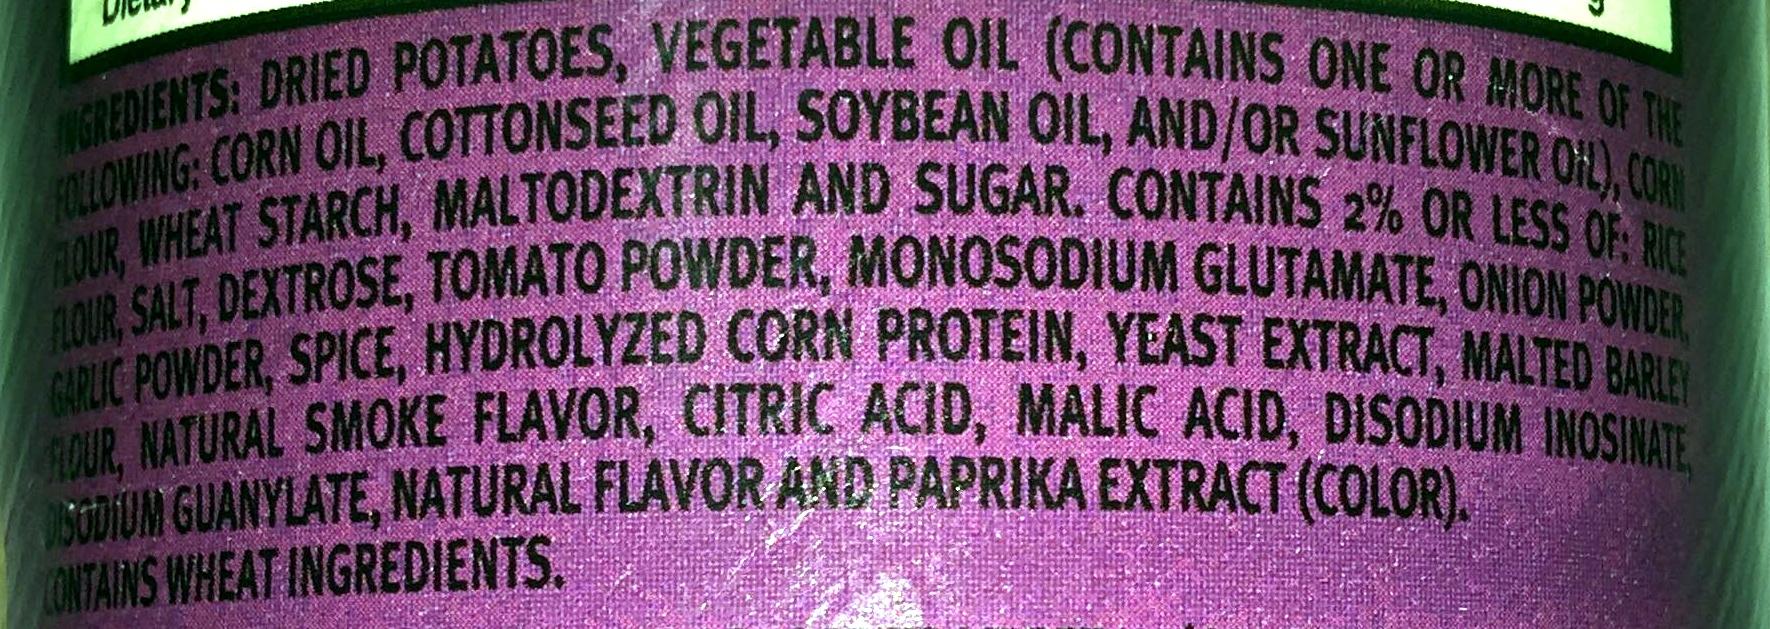 Bbq potato crisps - Ingredients - en